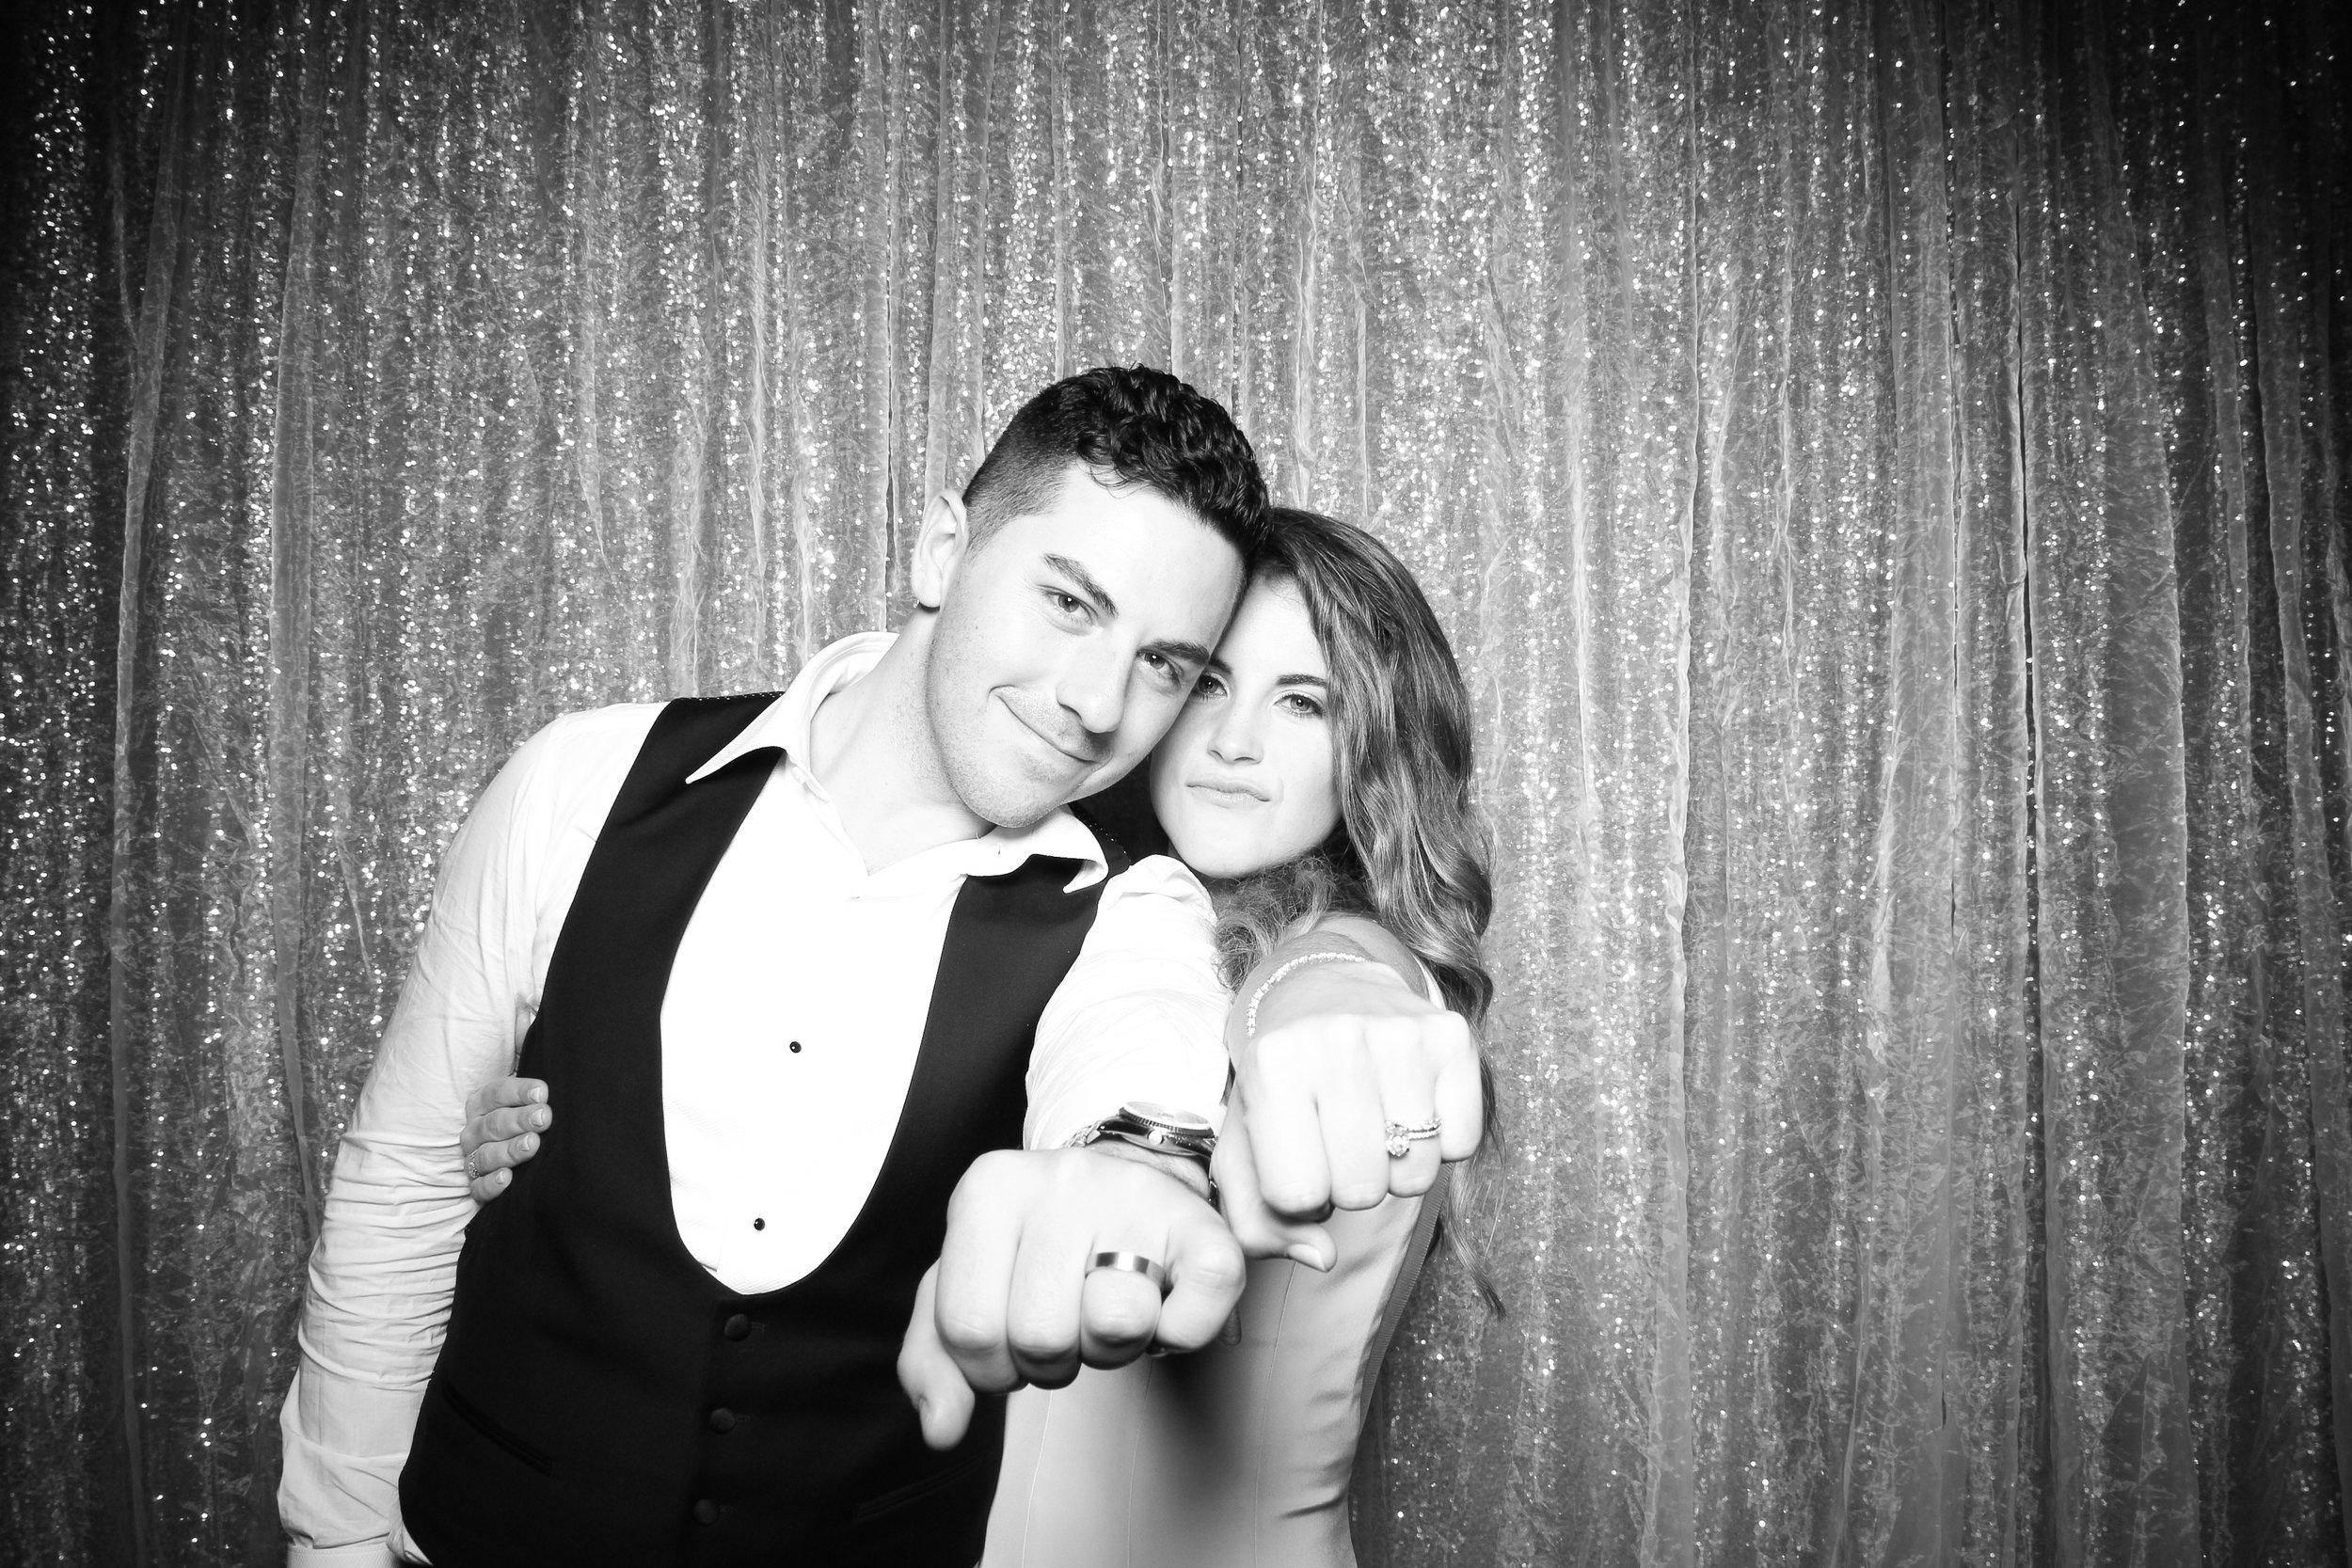 JW_Marriott_Burnham_Ballroom_Wedding_Photo_Booth_18.jpg